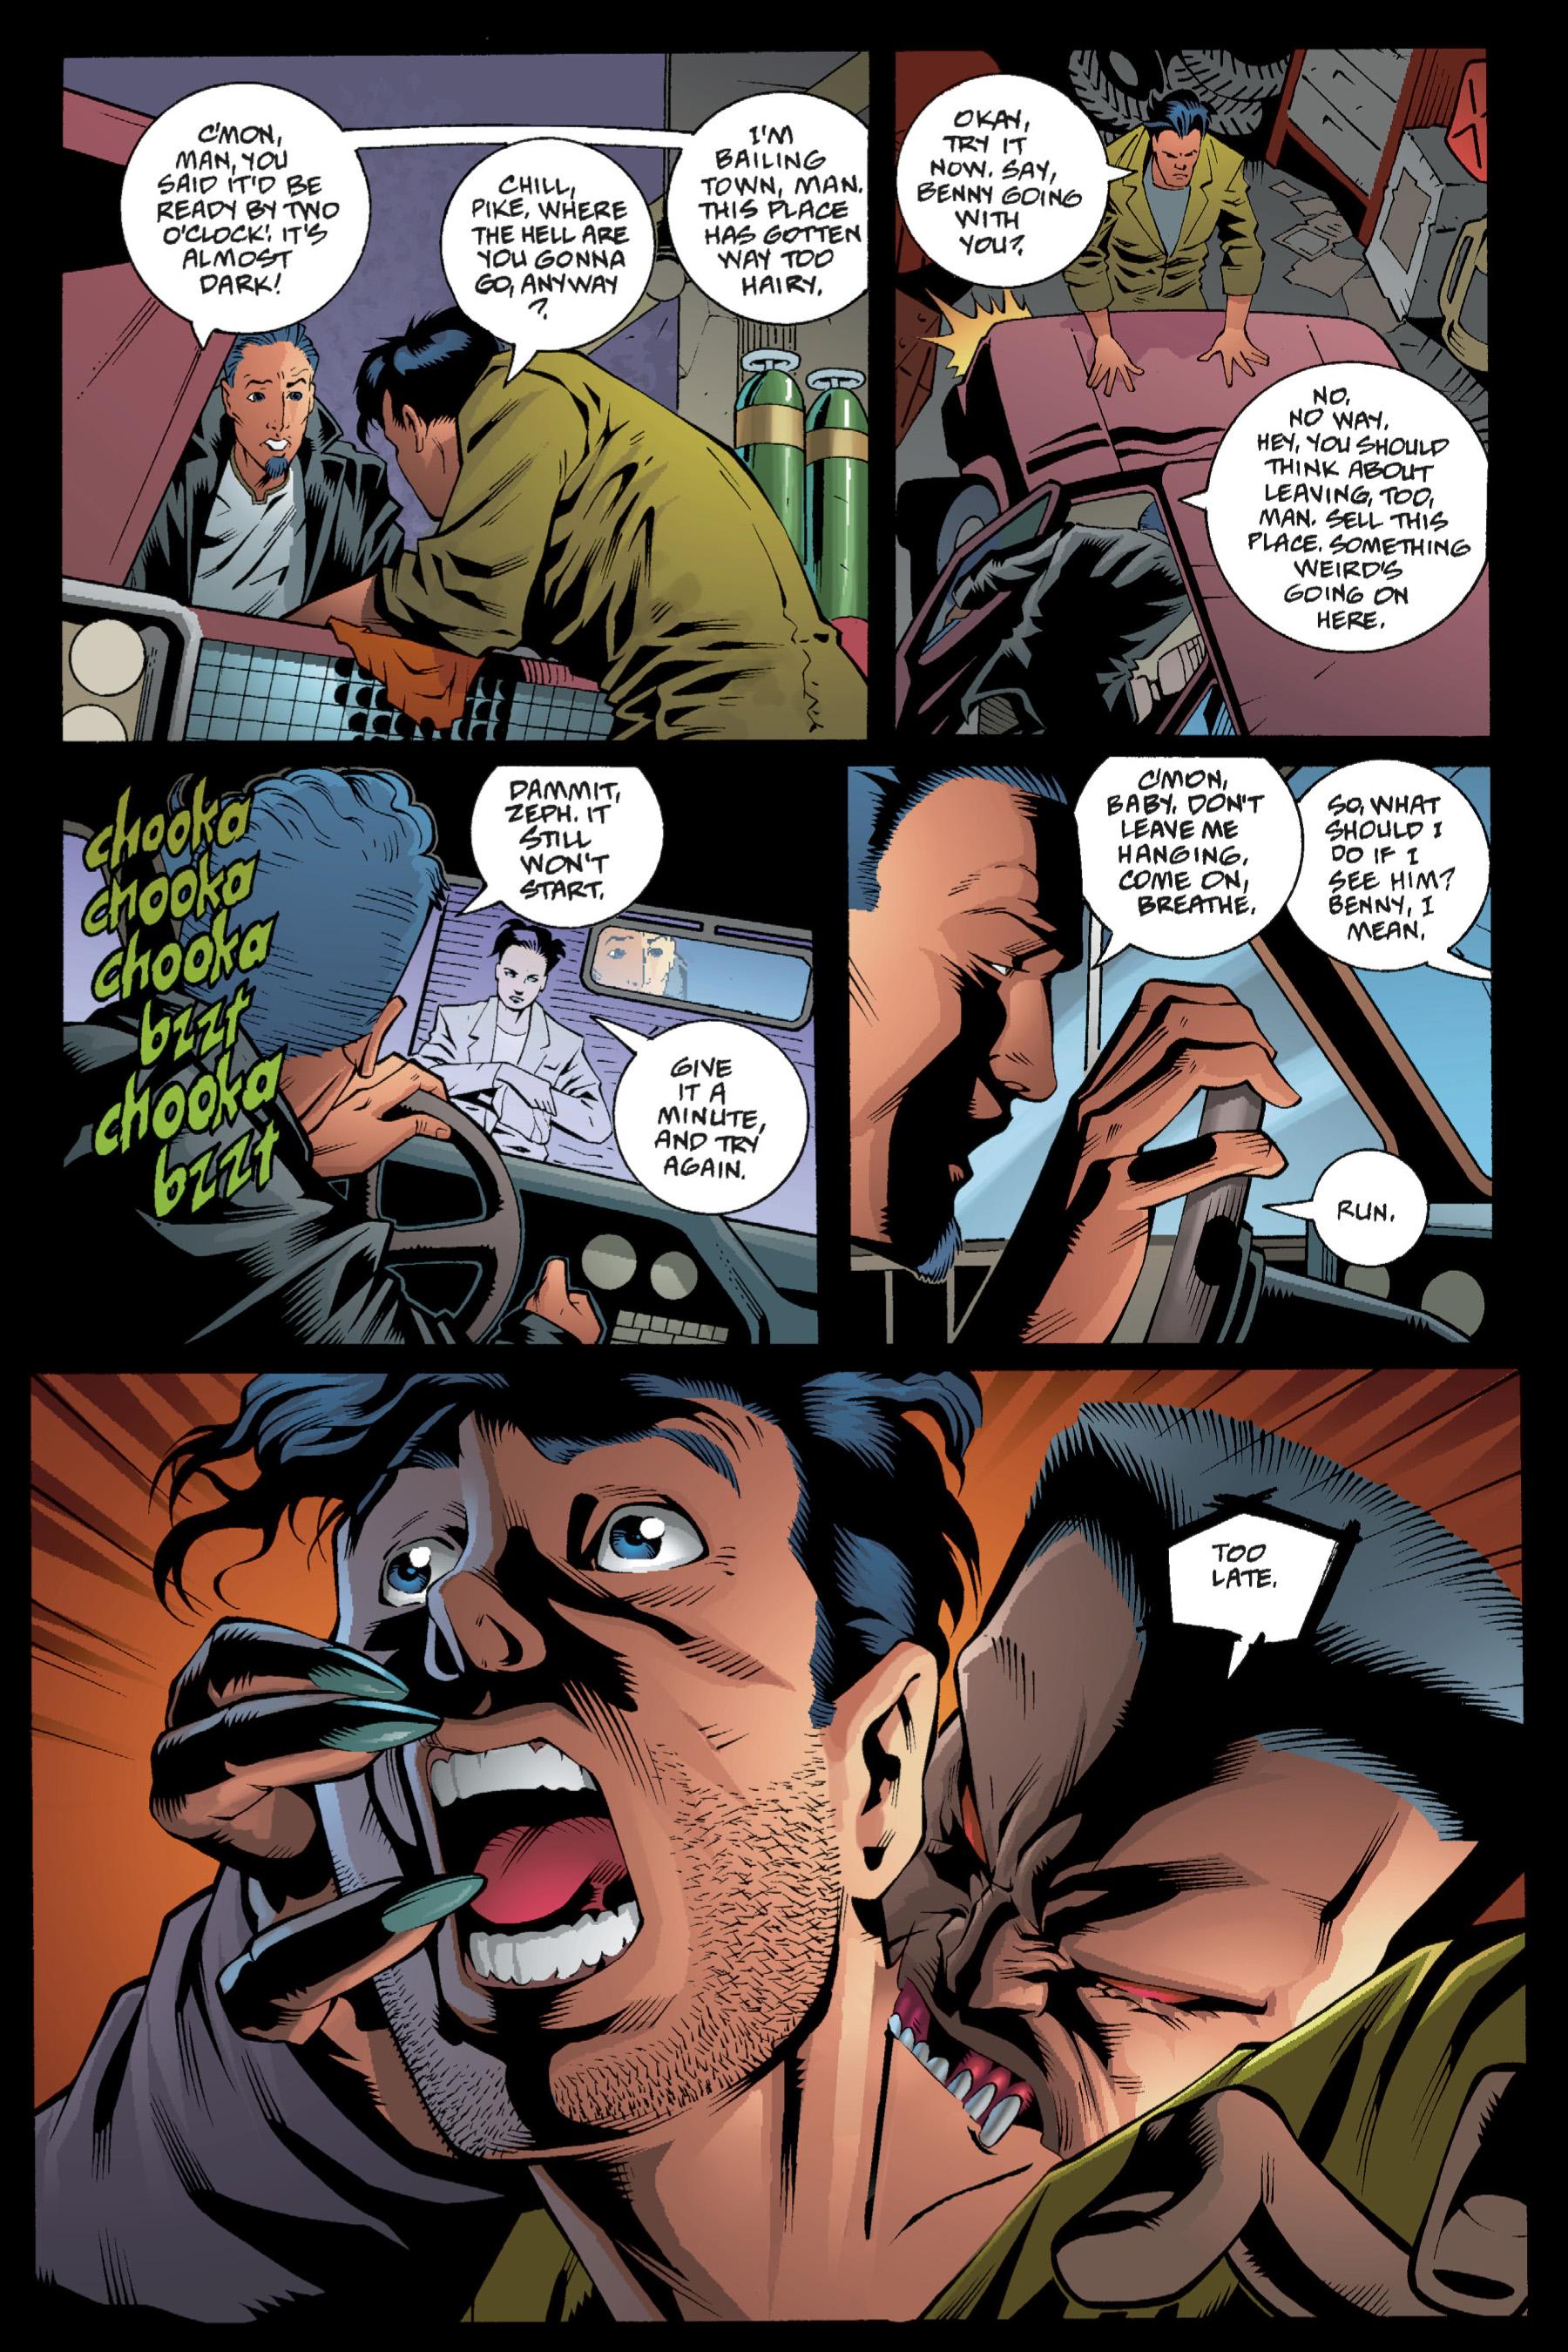 Read online Buffy the Vampire Slayer: Omnibus comic -  Issue # TPB 1 - 73